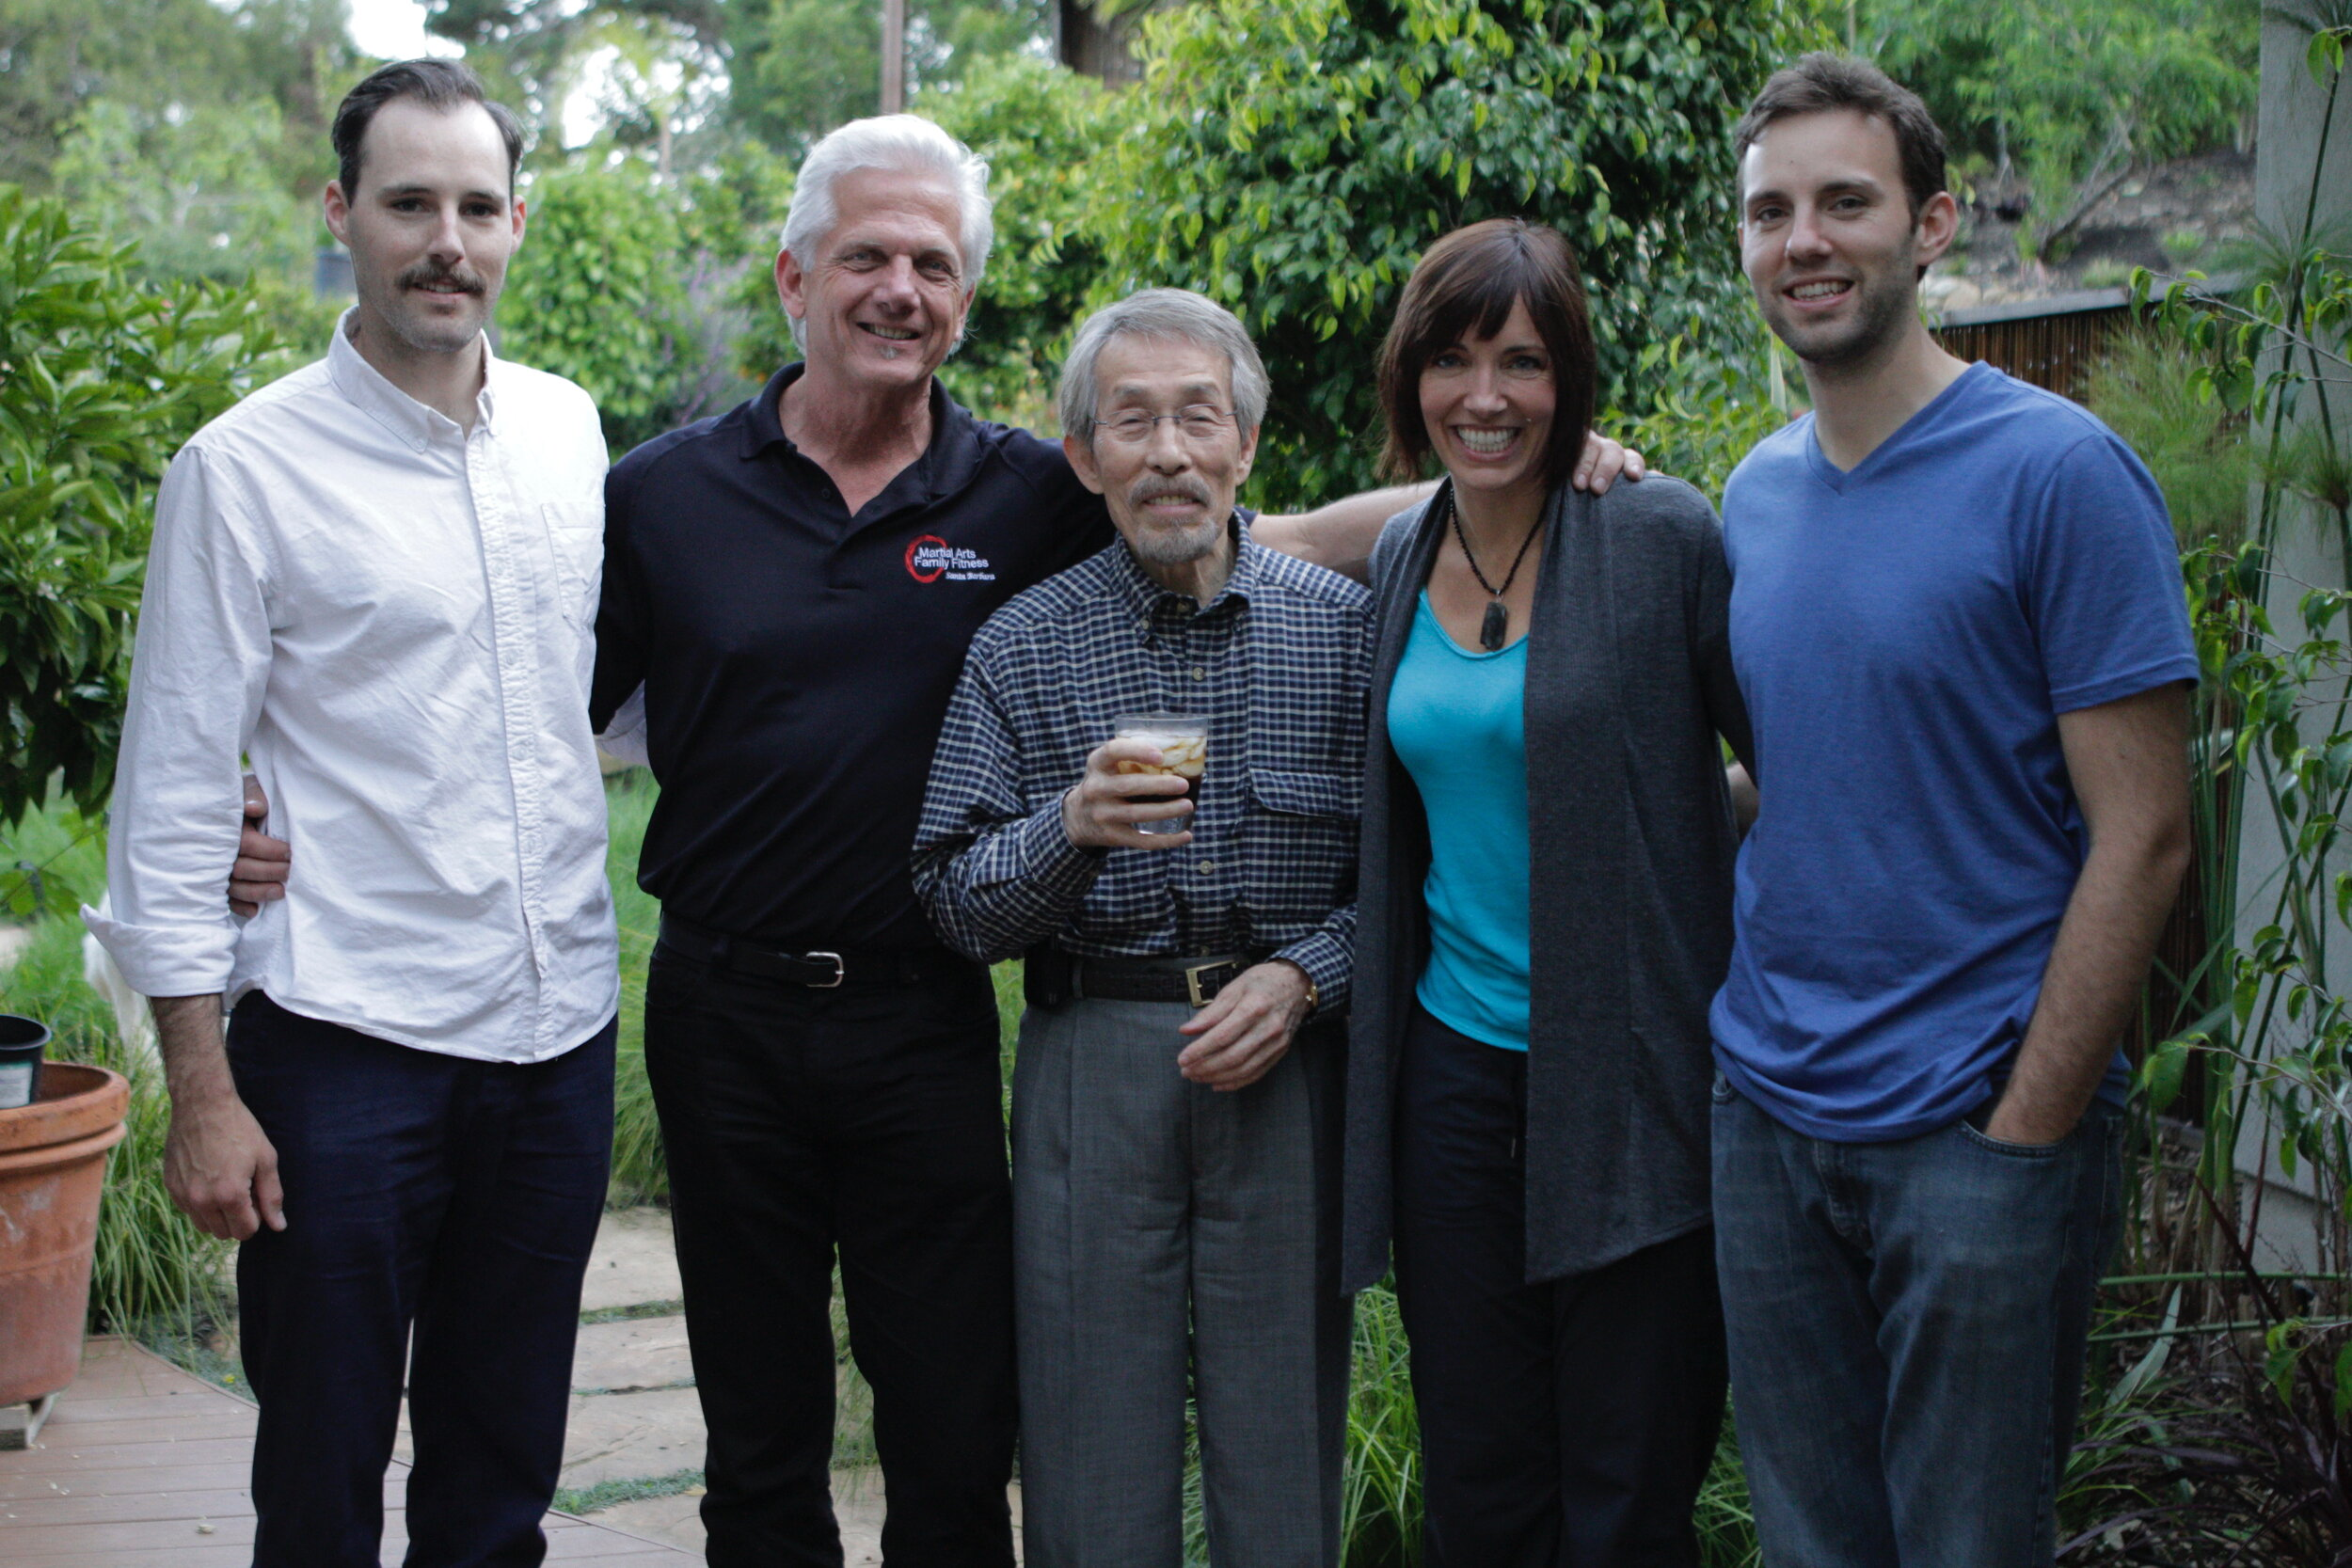 From left: Master Garret, GM Dave, GM Yi, Master Mel, Master Austin